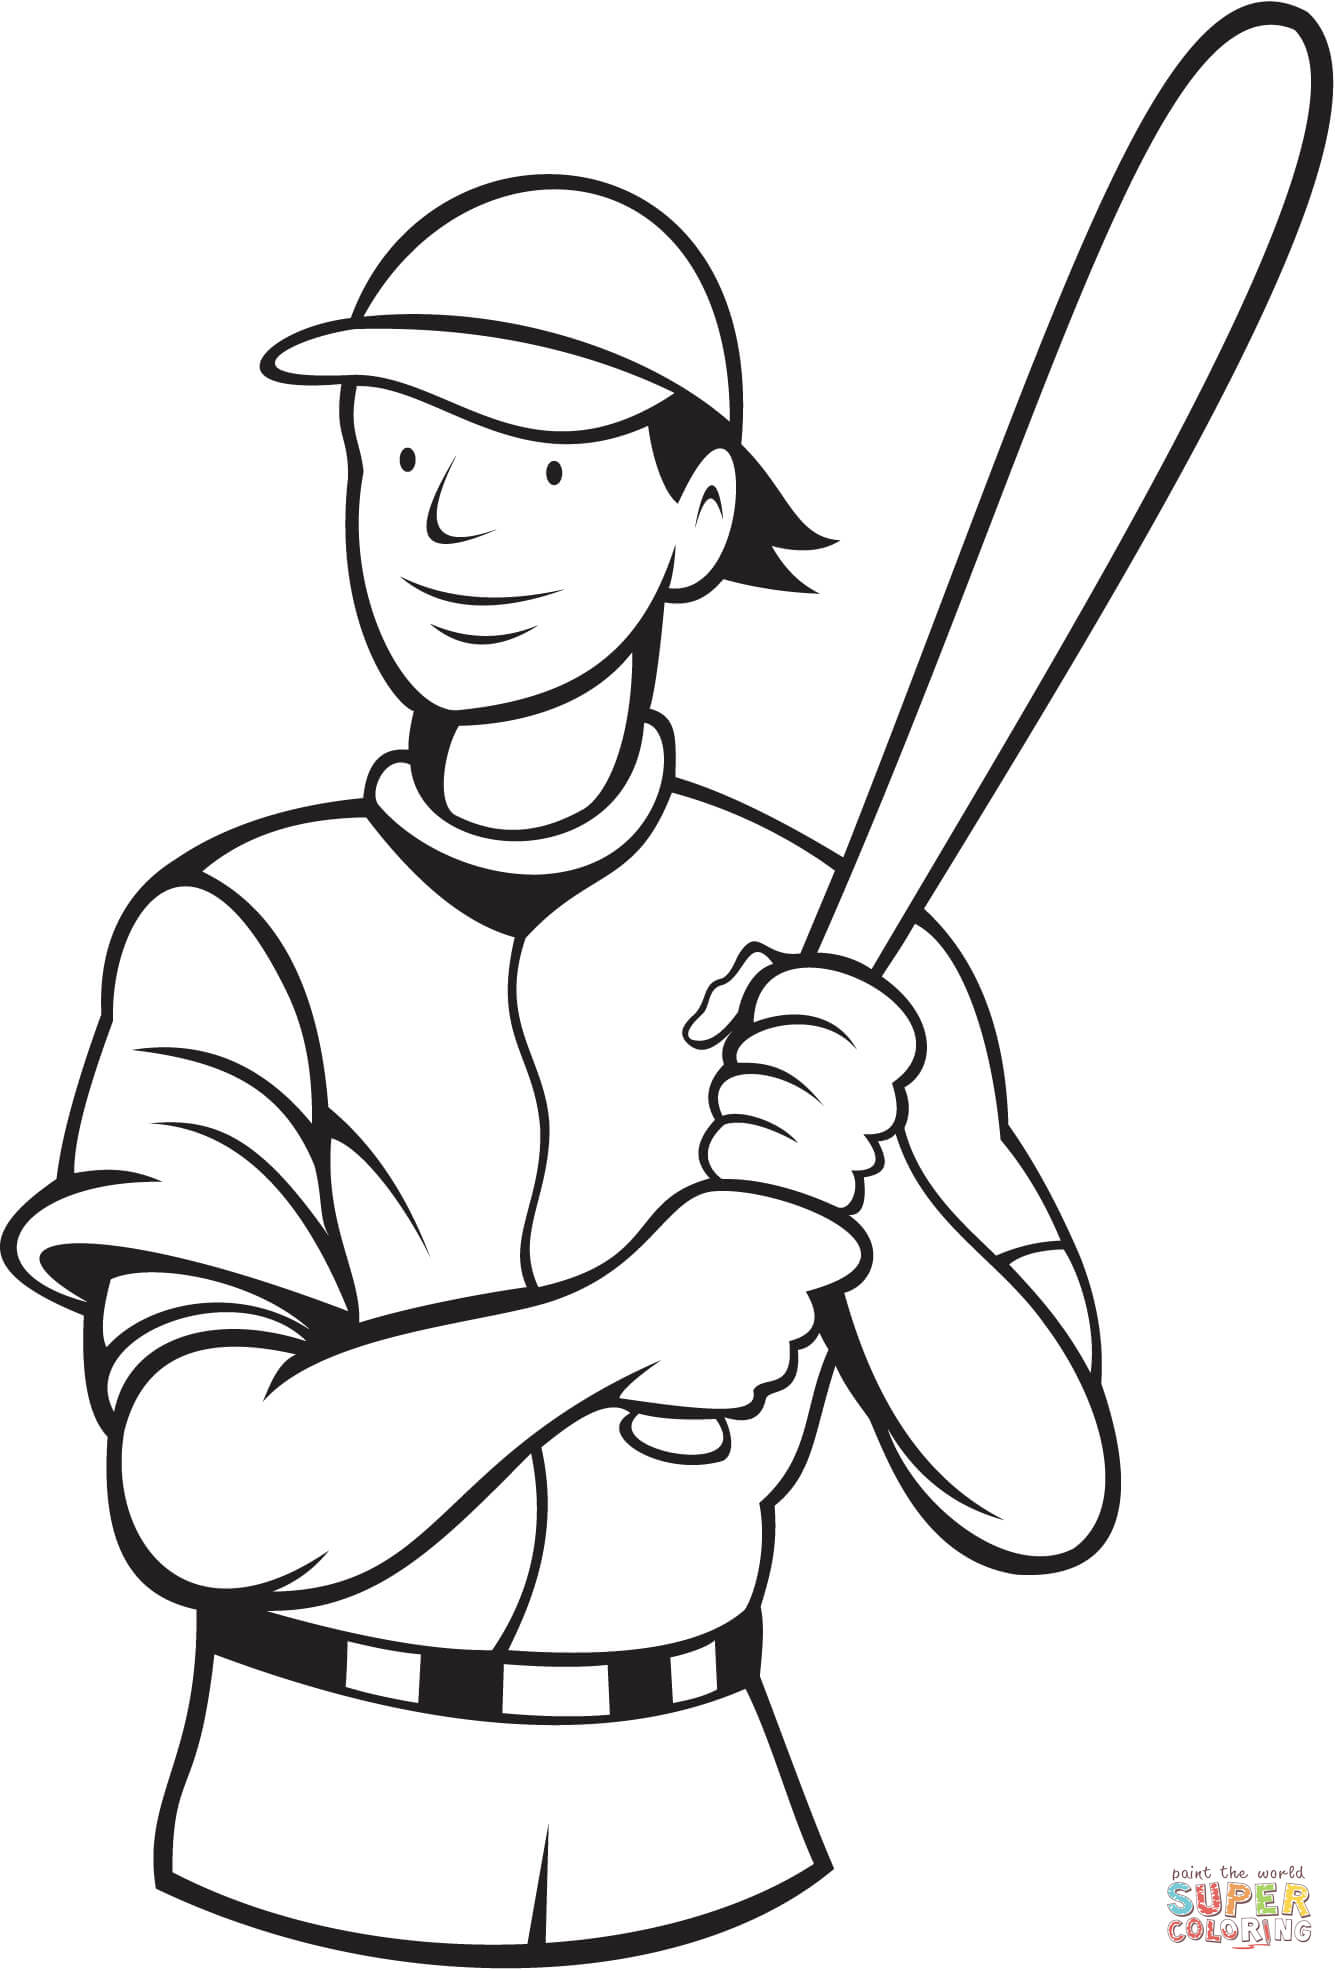 Baseball Batting Stance Coloring Page